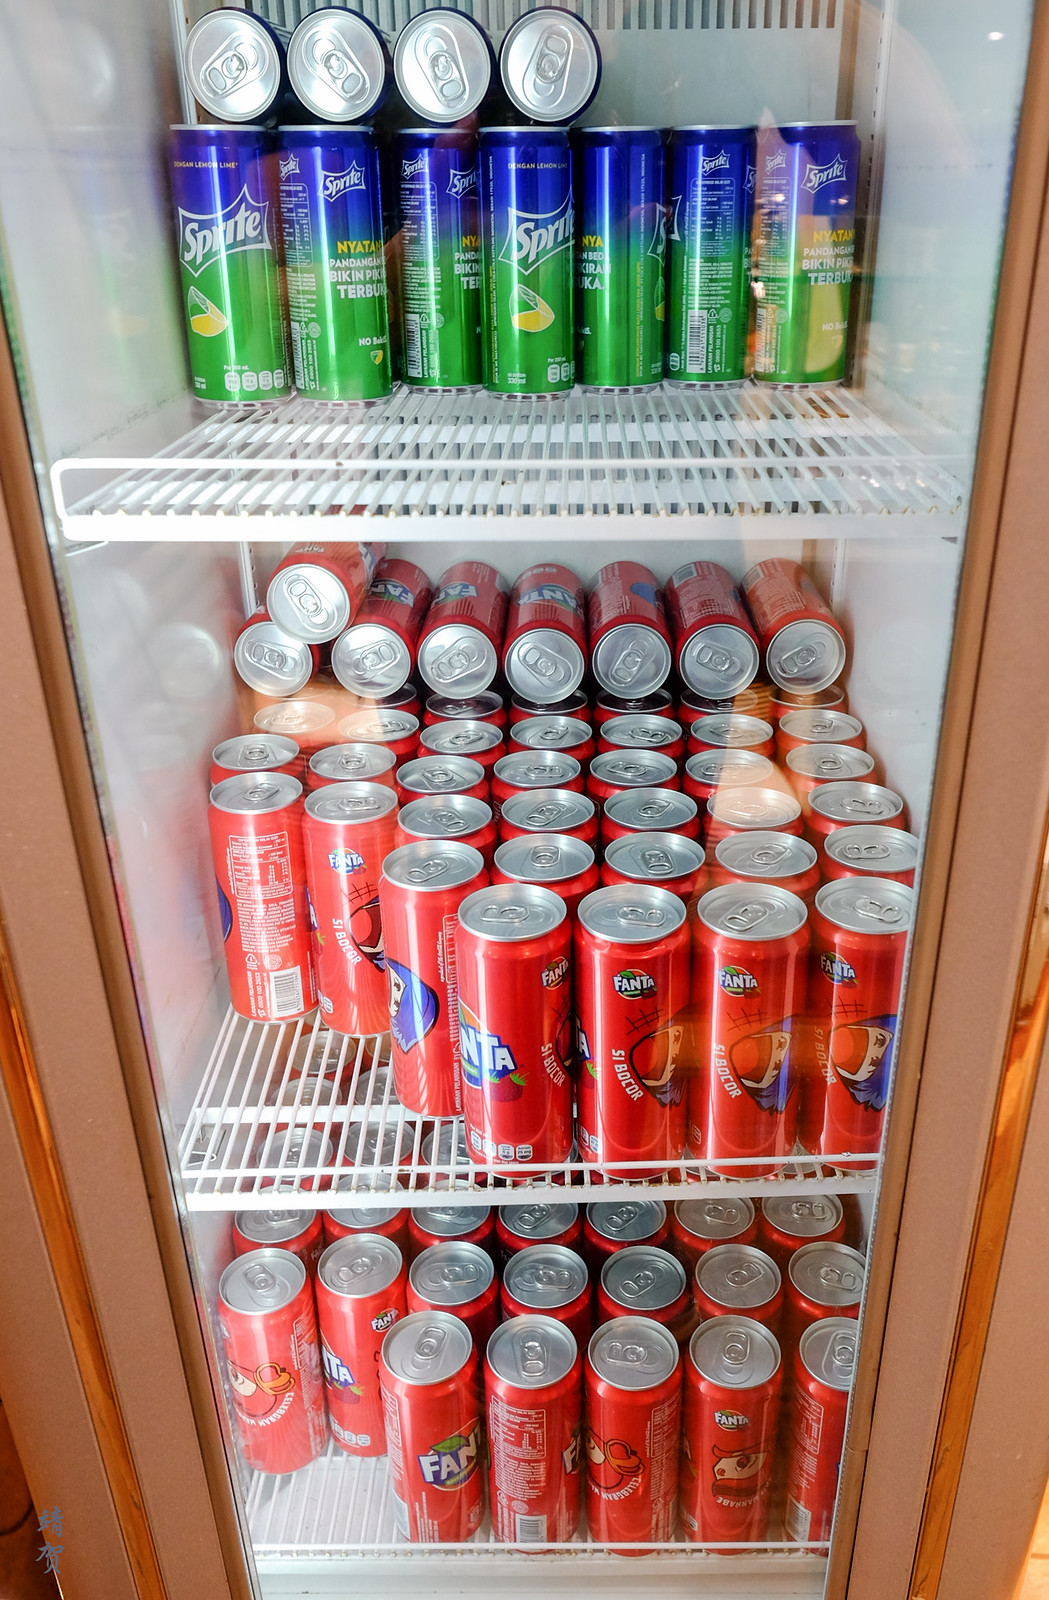 Soft drinks in the fridge